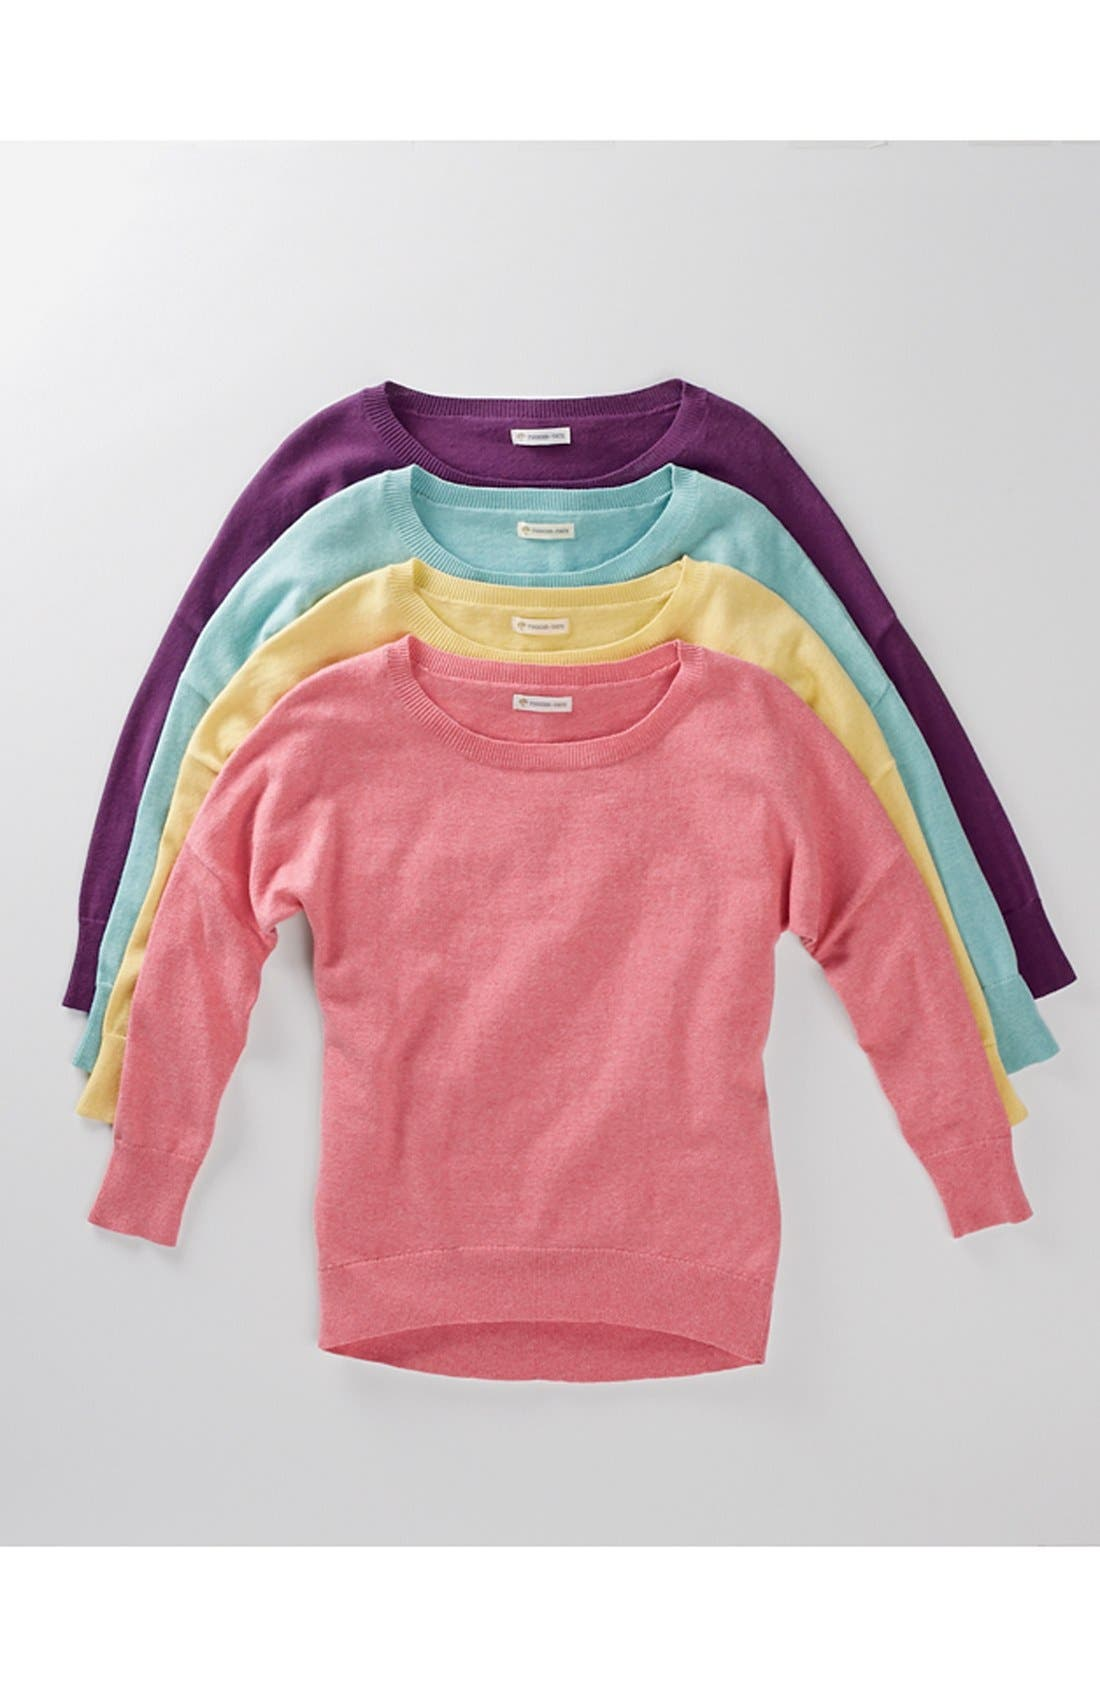 Alternate Image 2  - Tucker + Tate High Low Cotton & Cashmere Sweater (Little Girls & Big Girls)